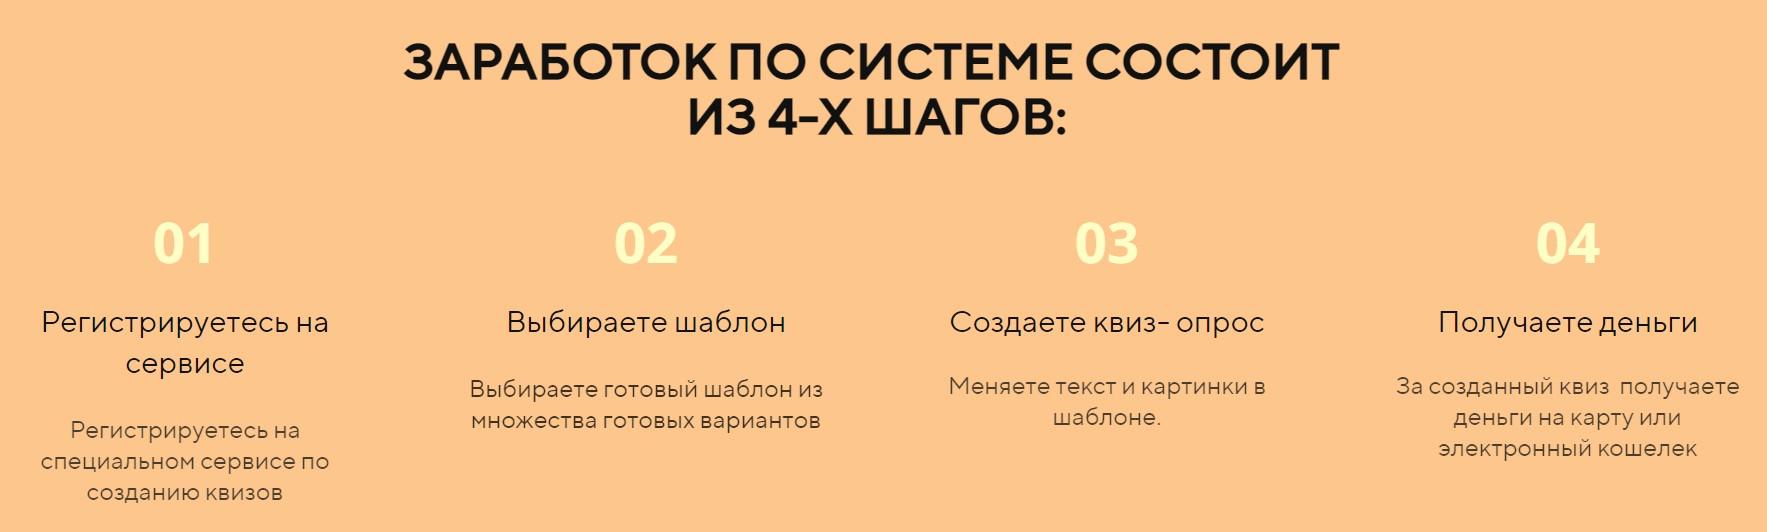 Система Быстрый Квиз, курс Быстрый Квиз, Софья Козырева